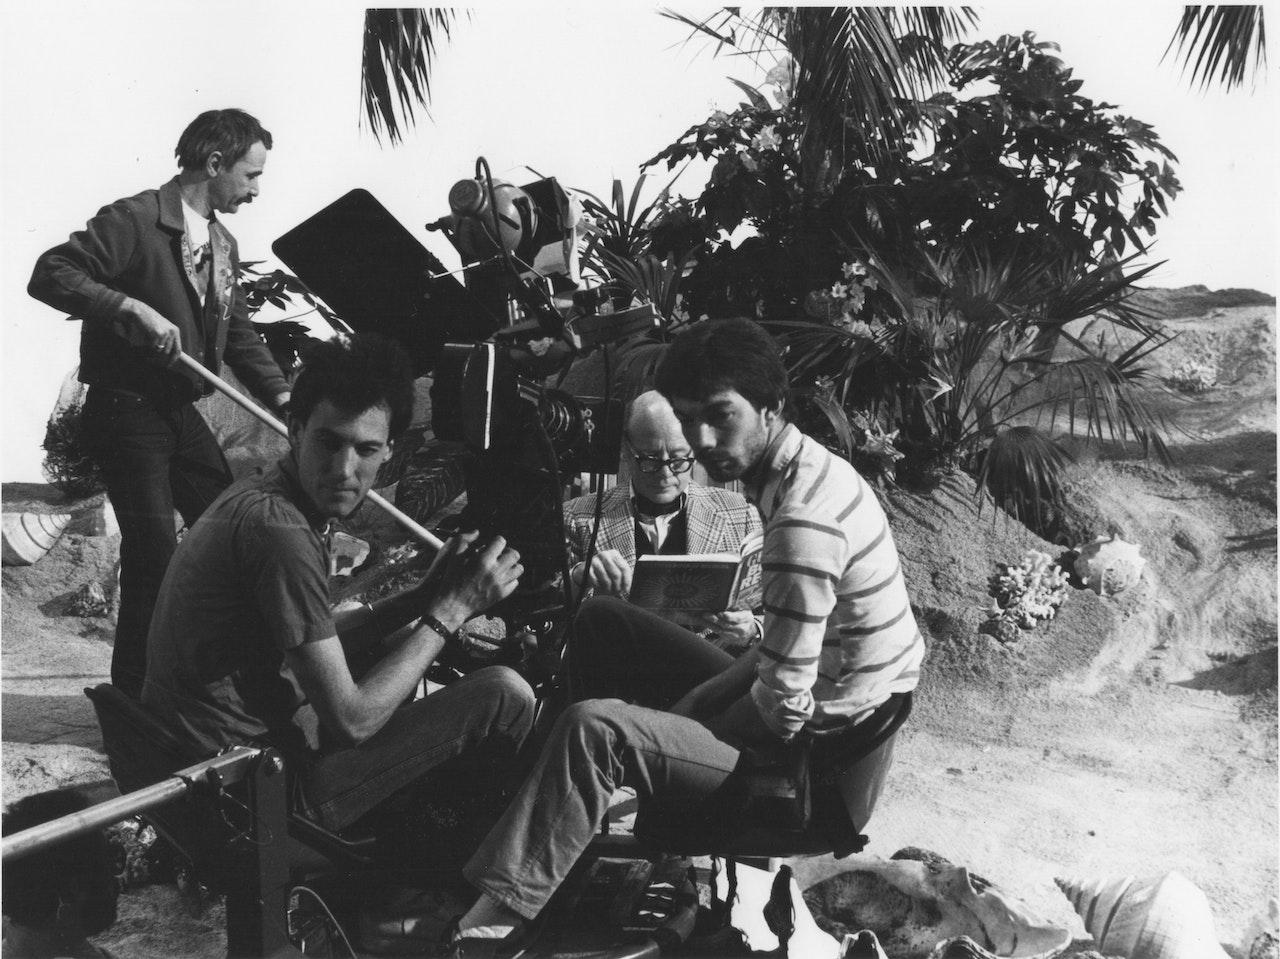 ARENA-DESERT ISLAND DISCS EALING STUDIOS BBC 1981